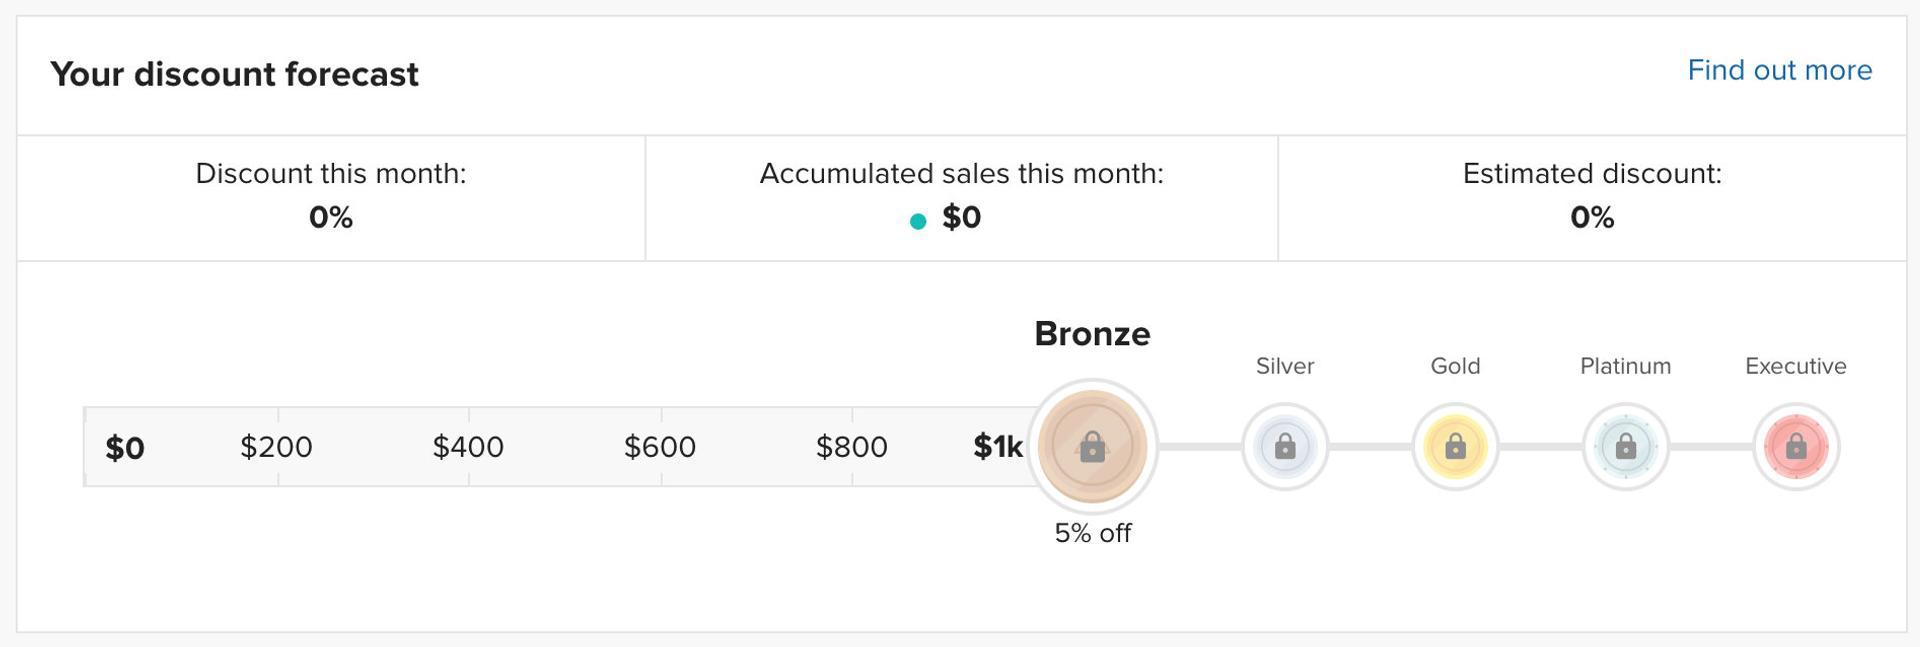 Printful discount tiers